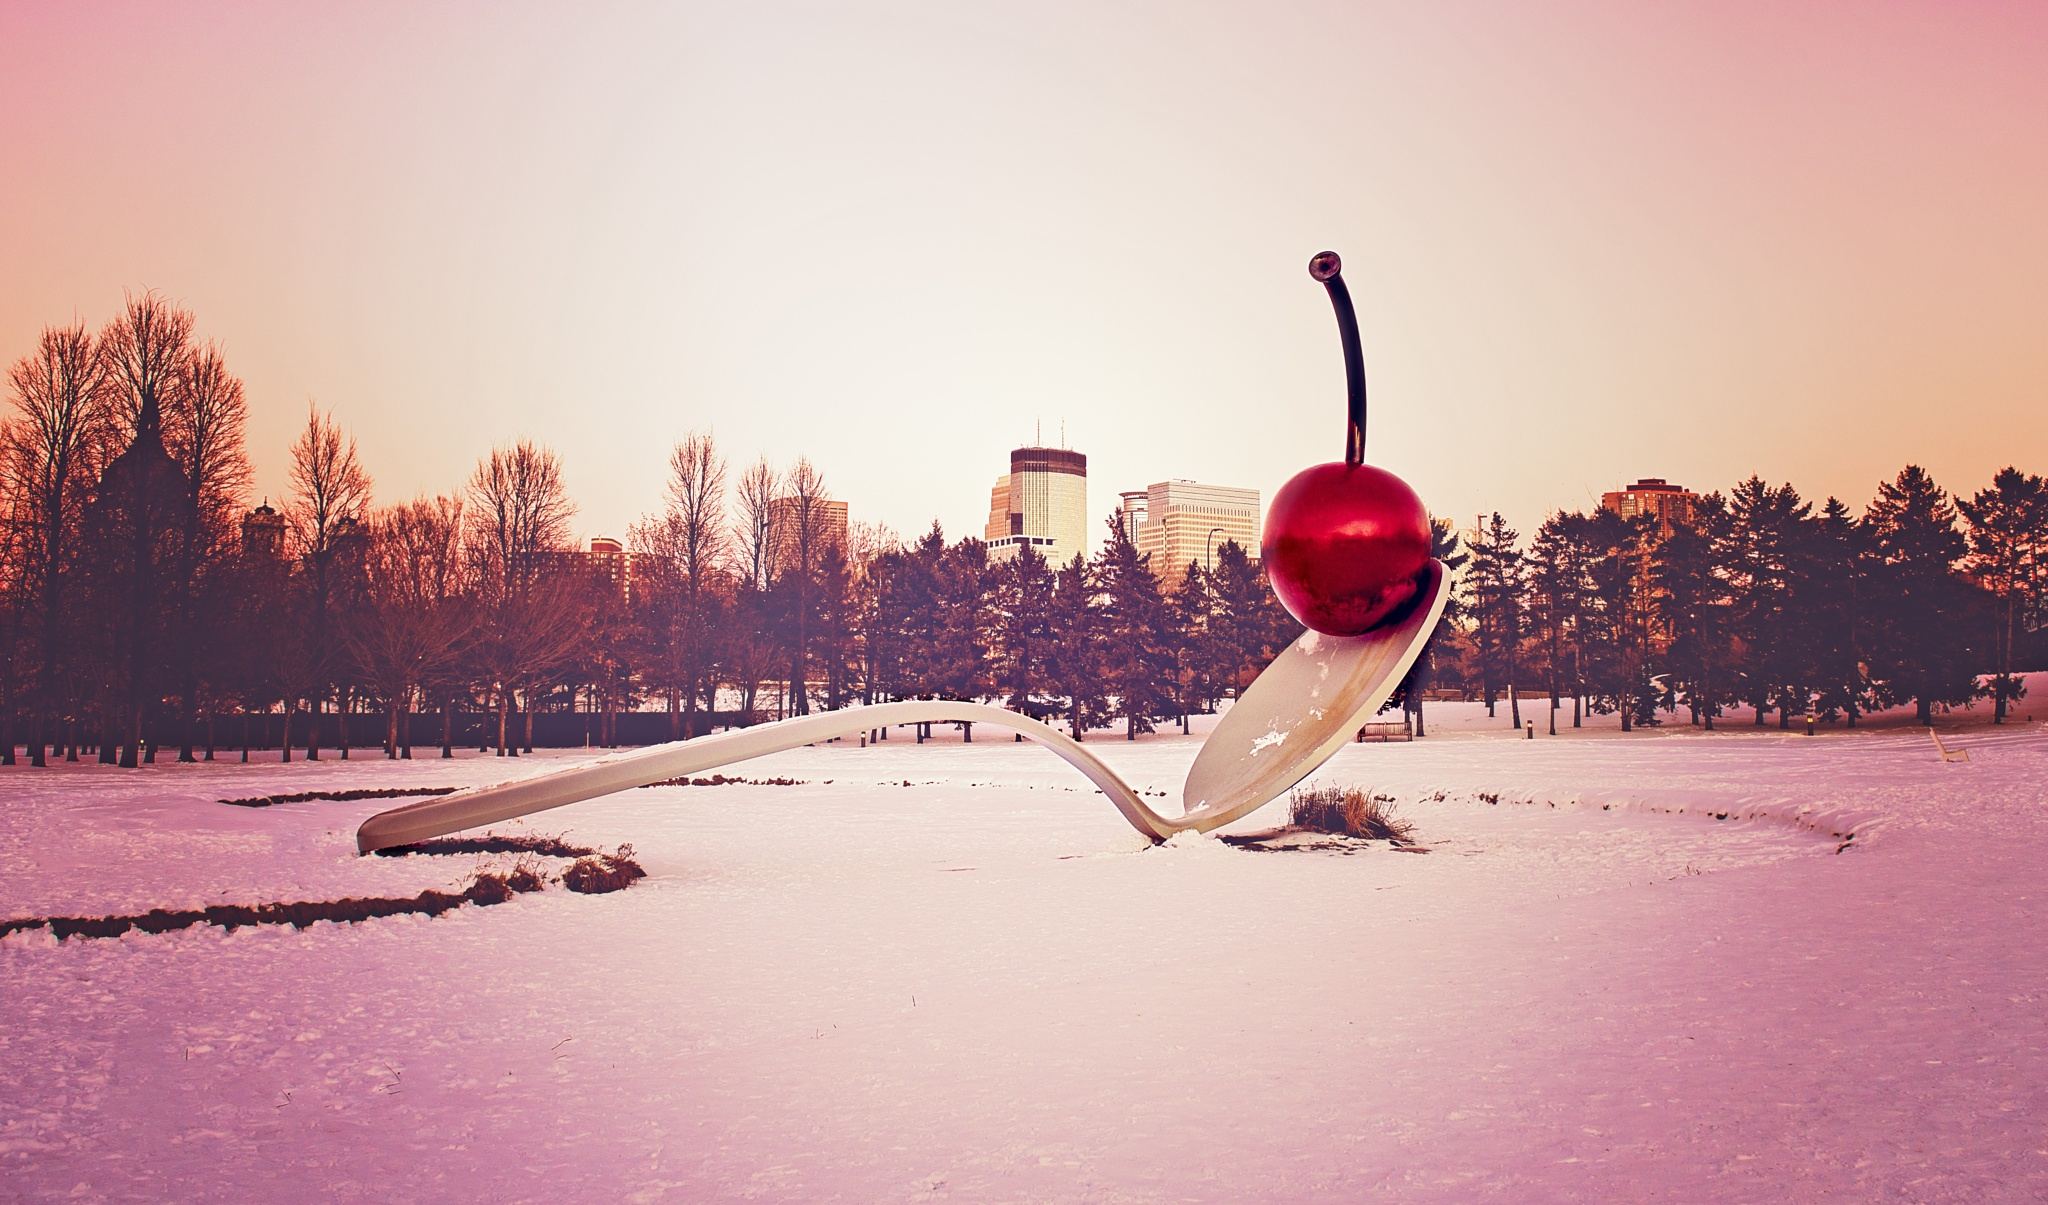 Cherry spoon Minneapolis by wandakayebacon